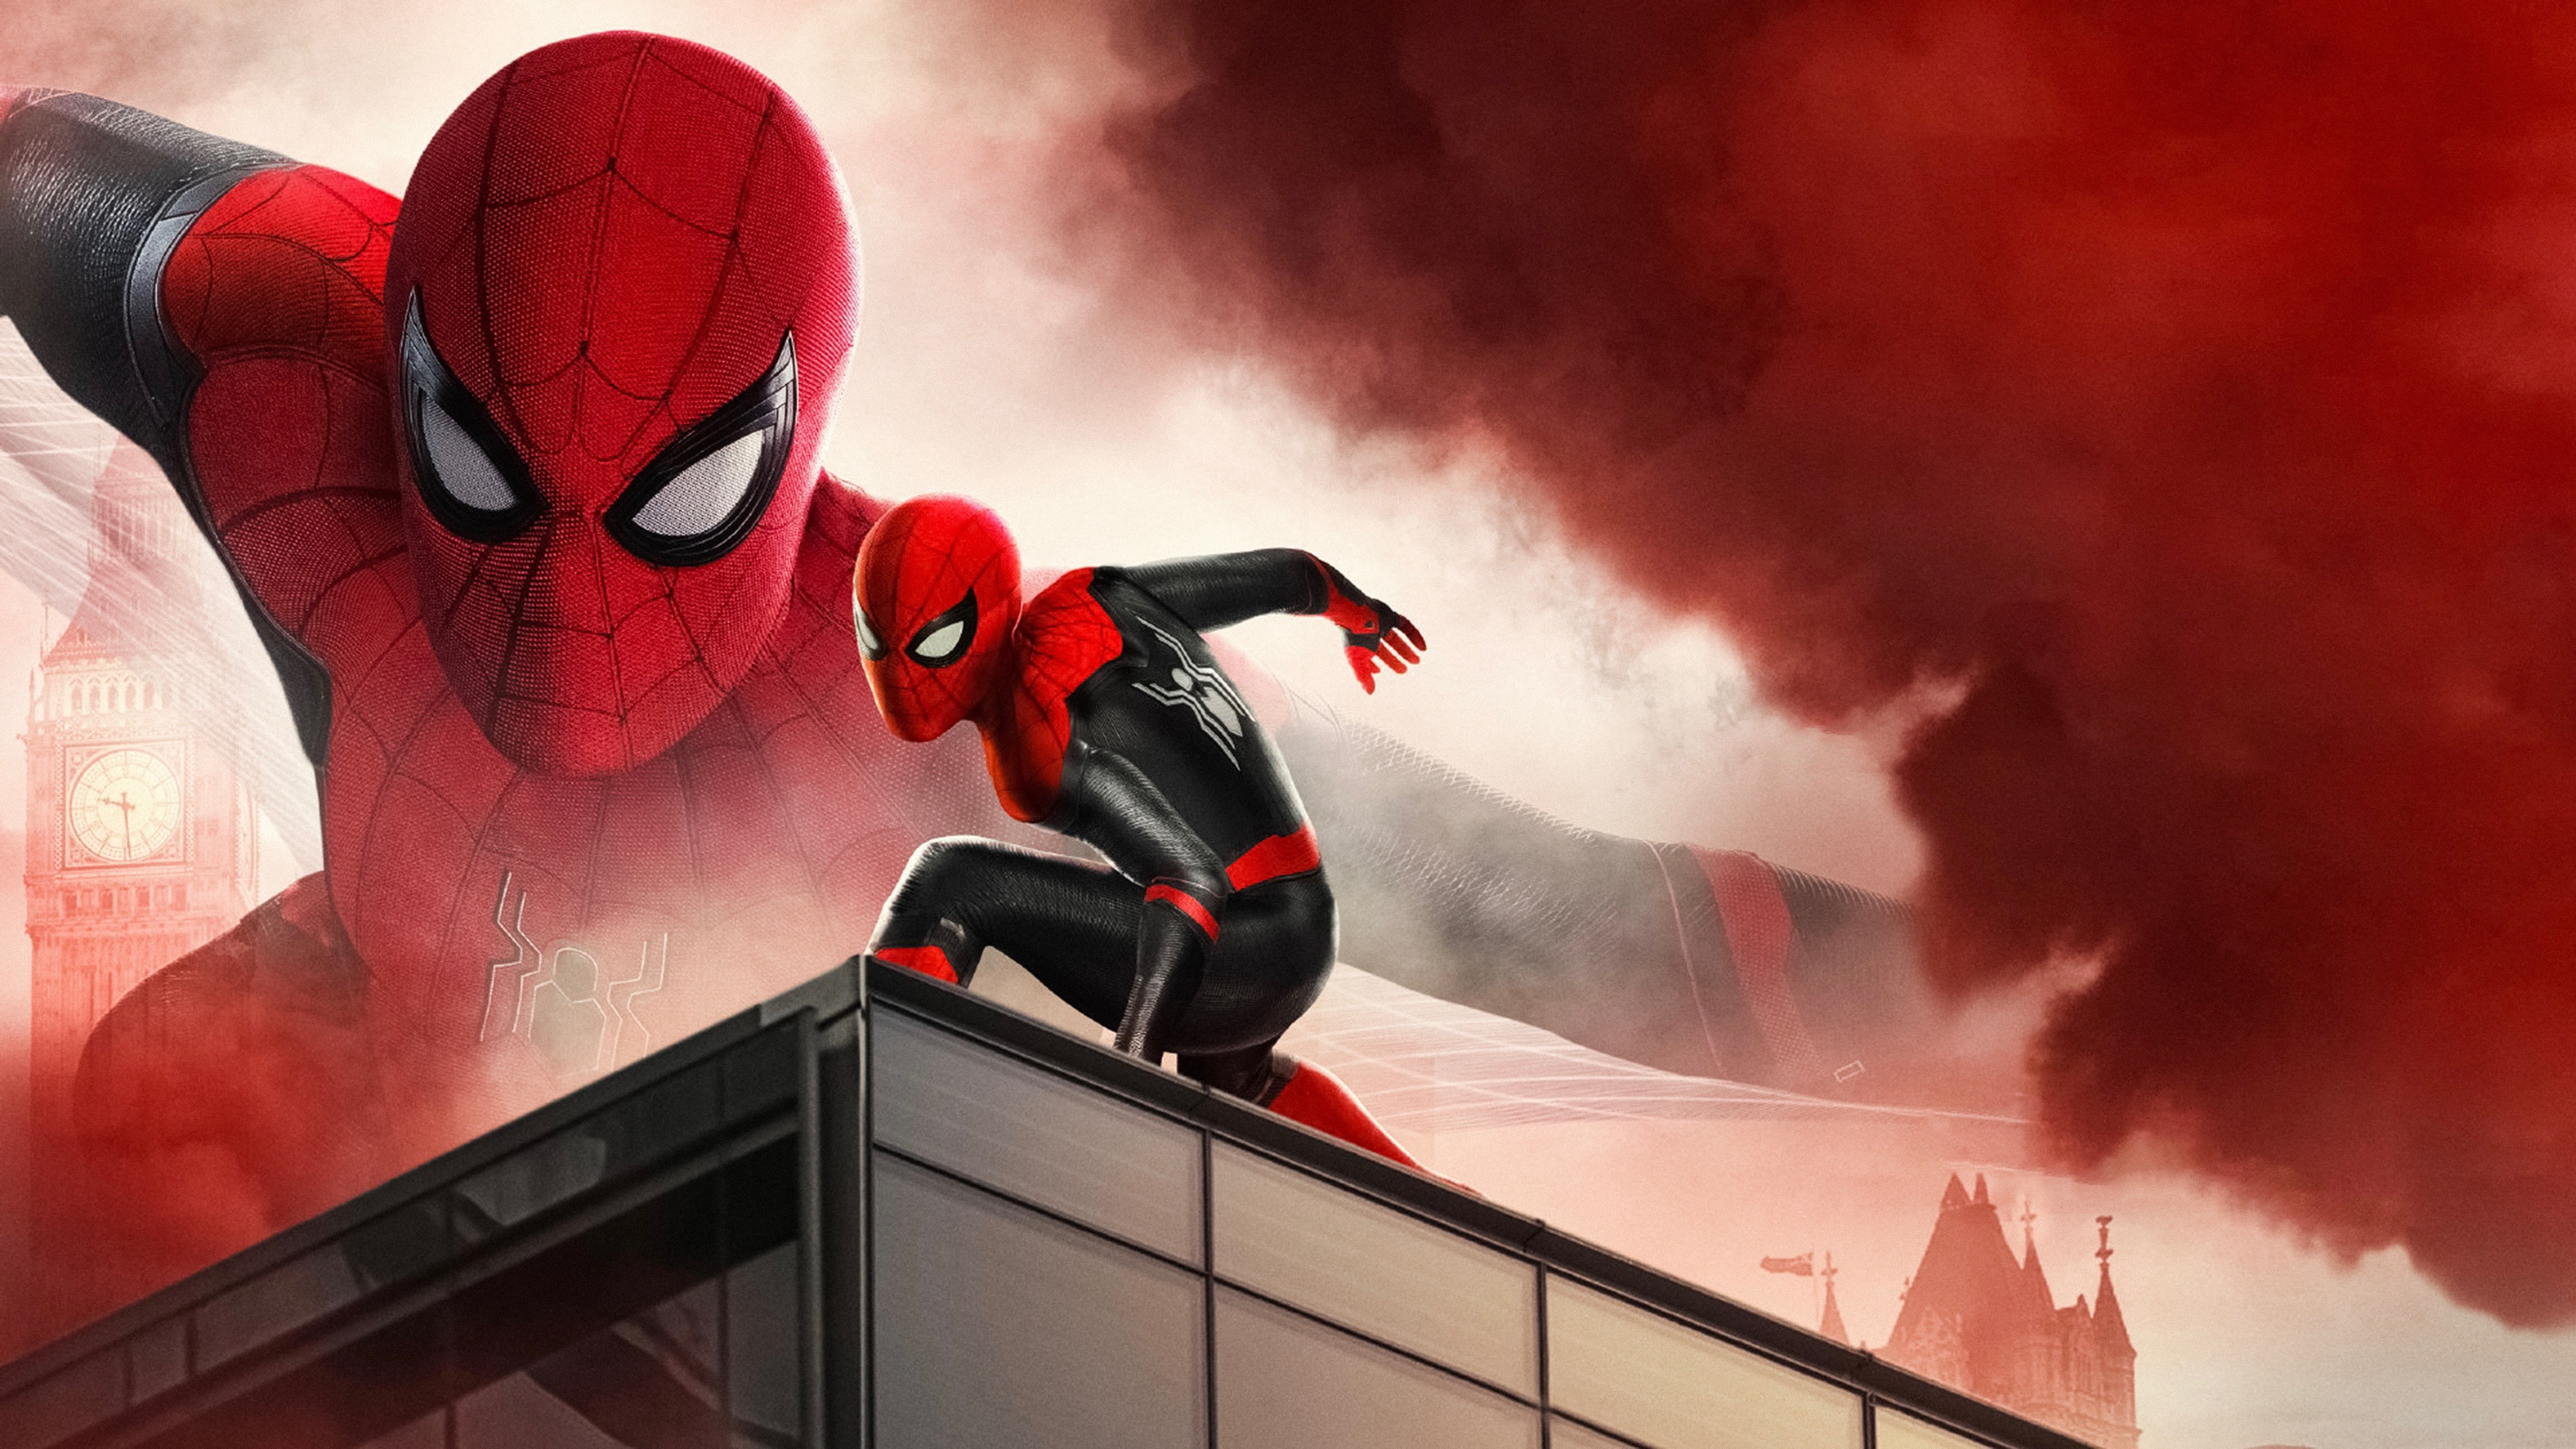 Spider Man Far From Home 4k Ultra Hd Wallpaper